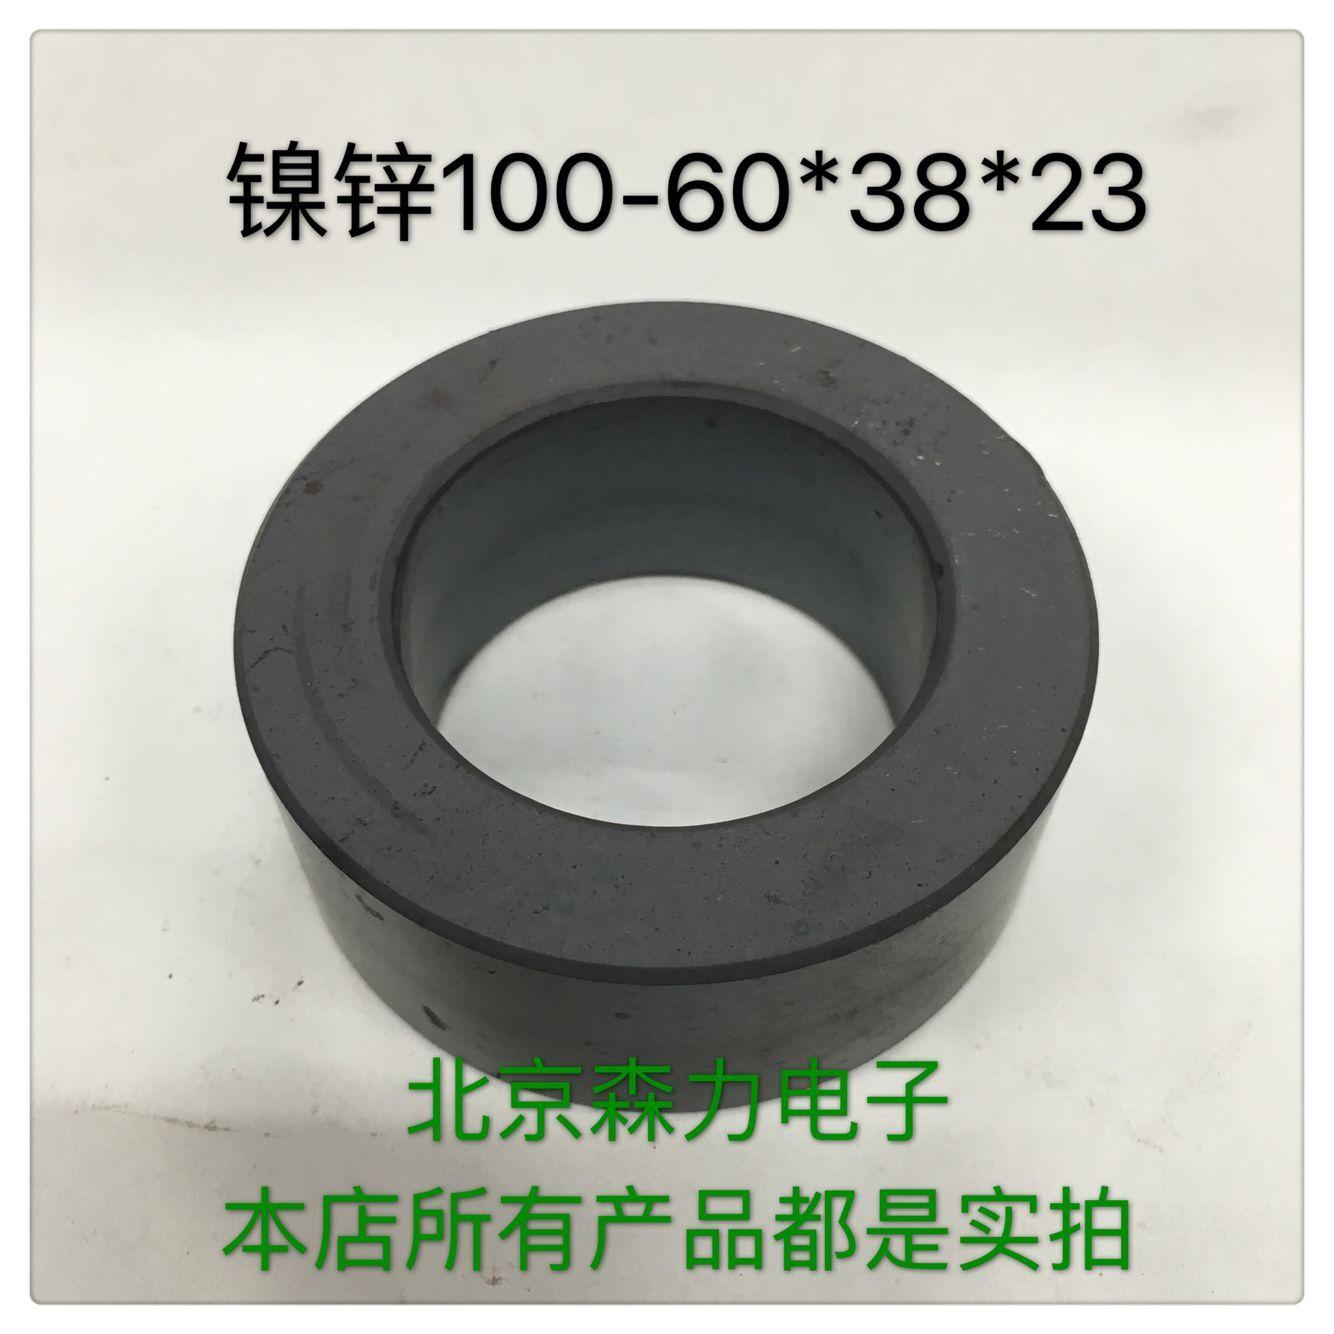 Nickel Zinc Magnetic Ring NXO-100 Anti-jamming Filter 60x38x20 High Frequency Welding Machine Antenna Short Wave